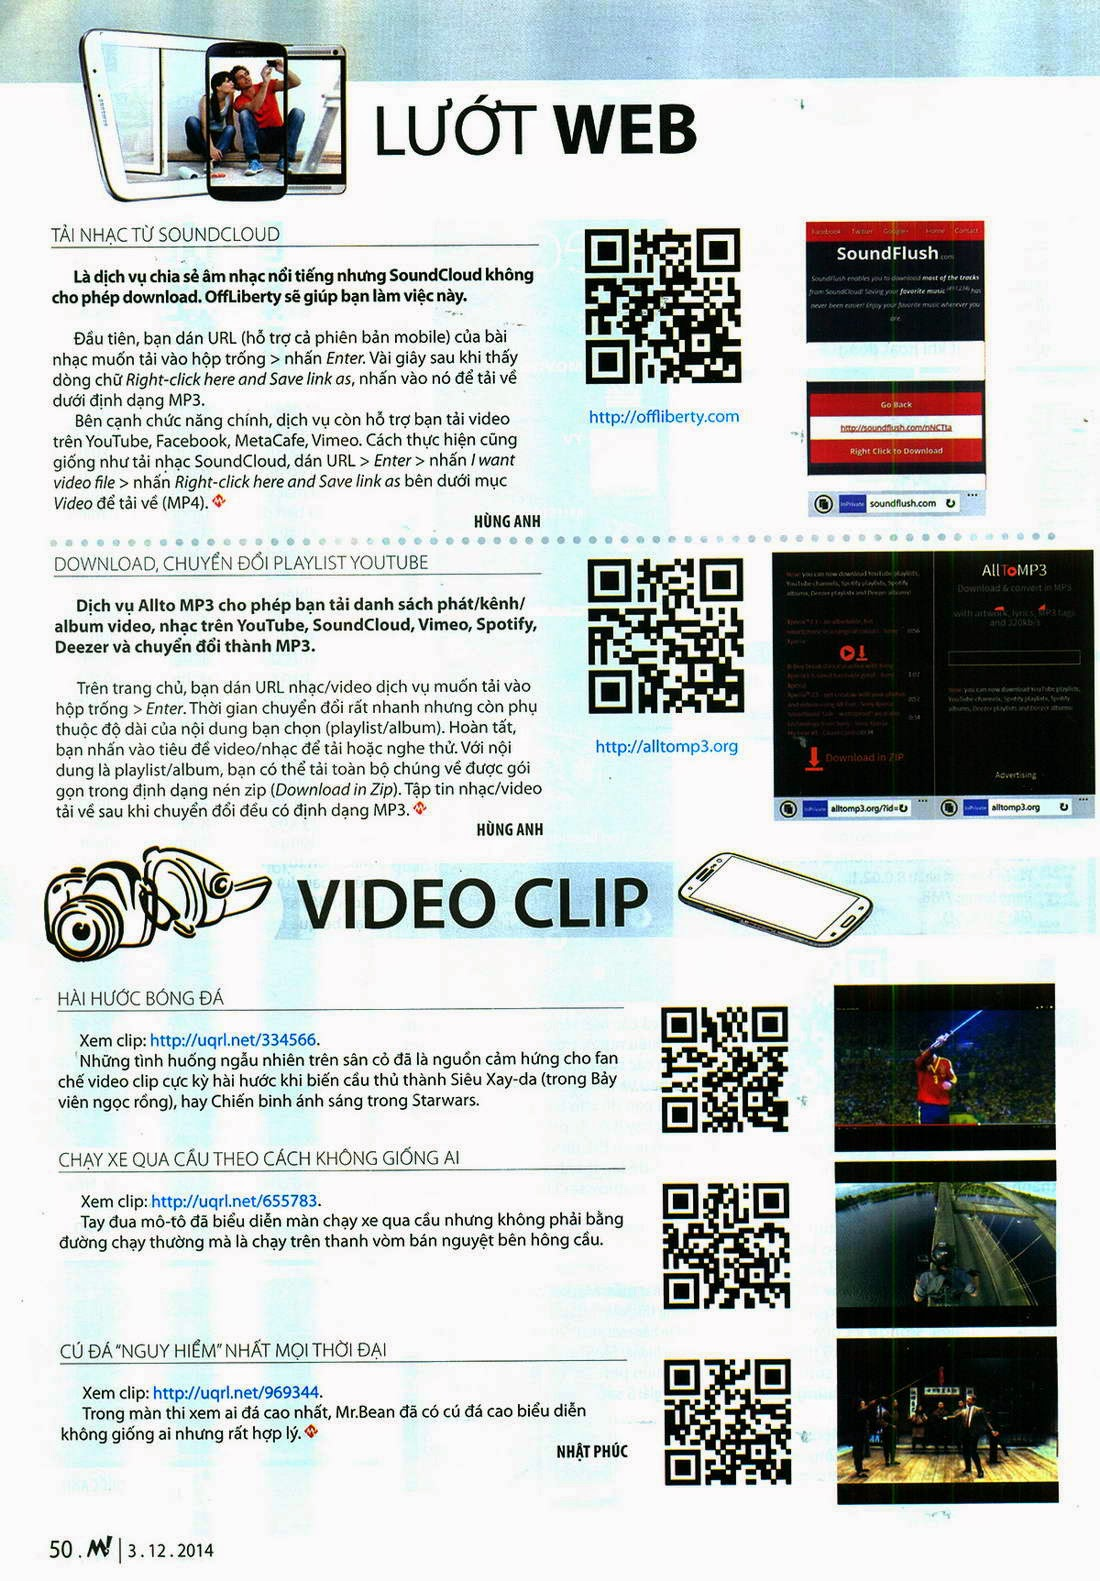 EChip Mobile 481 tapchicntt.com